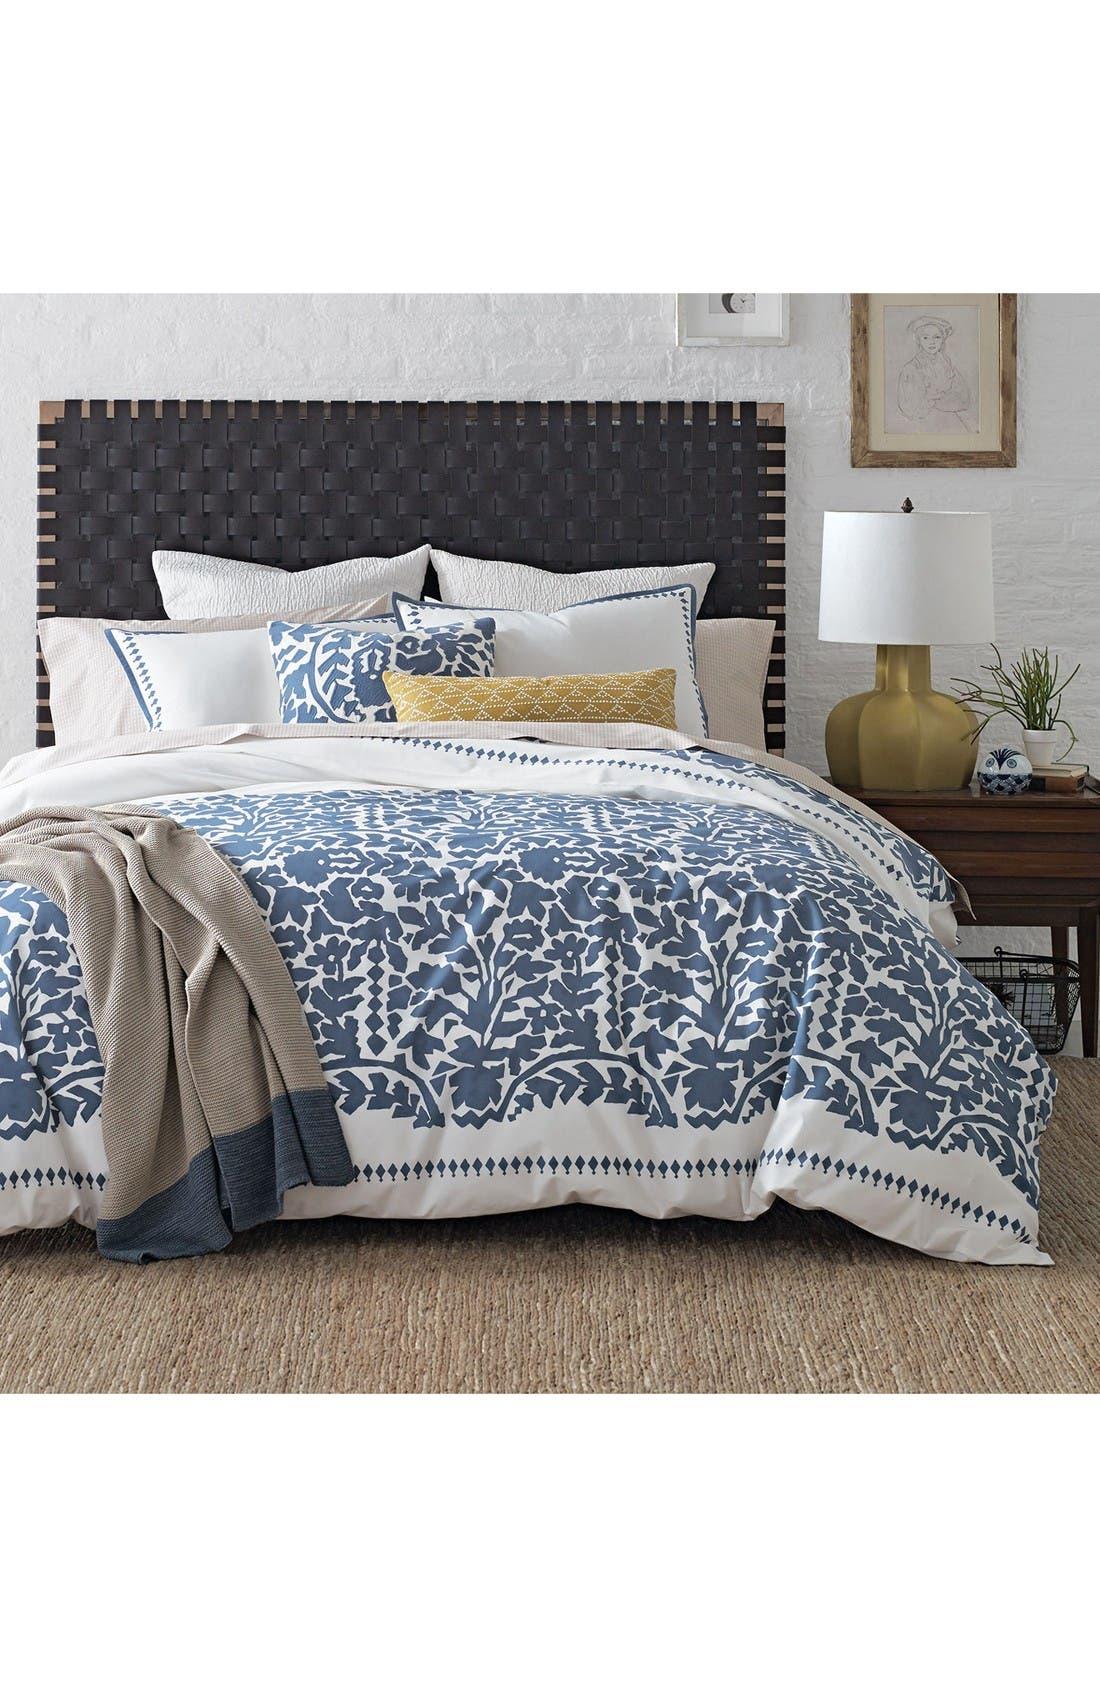 dwellstudio bedding sets  bedding collections  nordstrom -